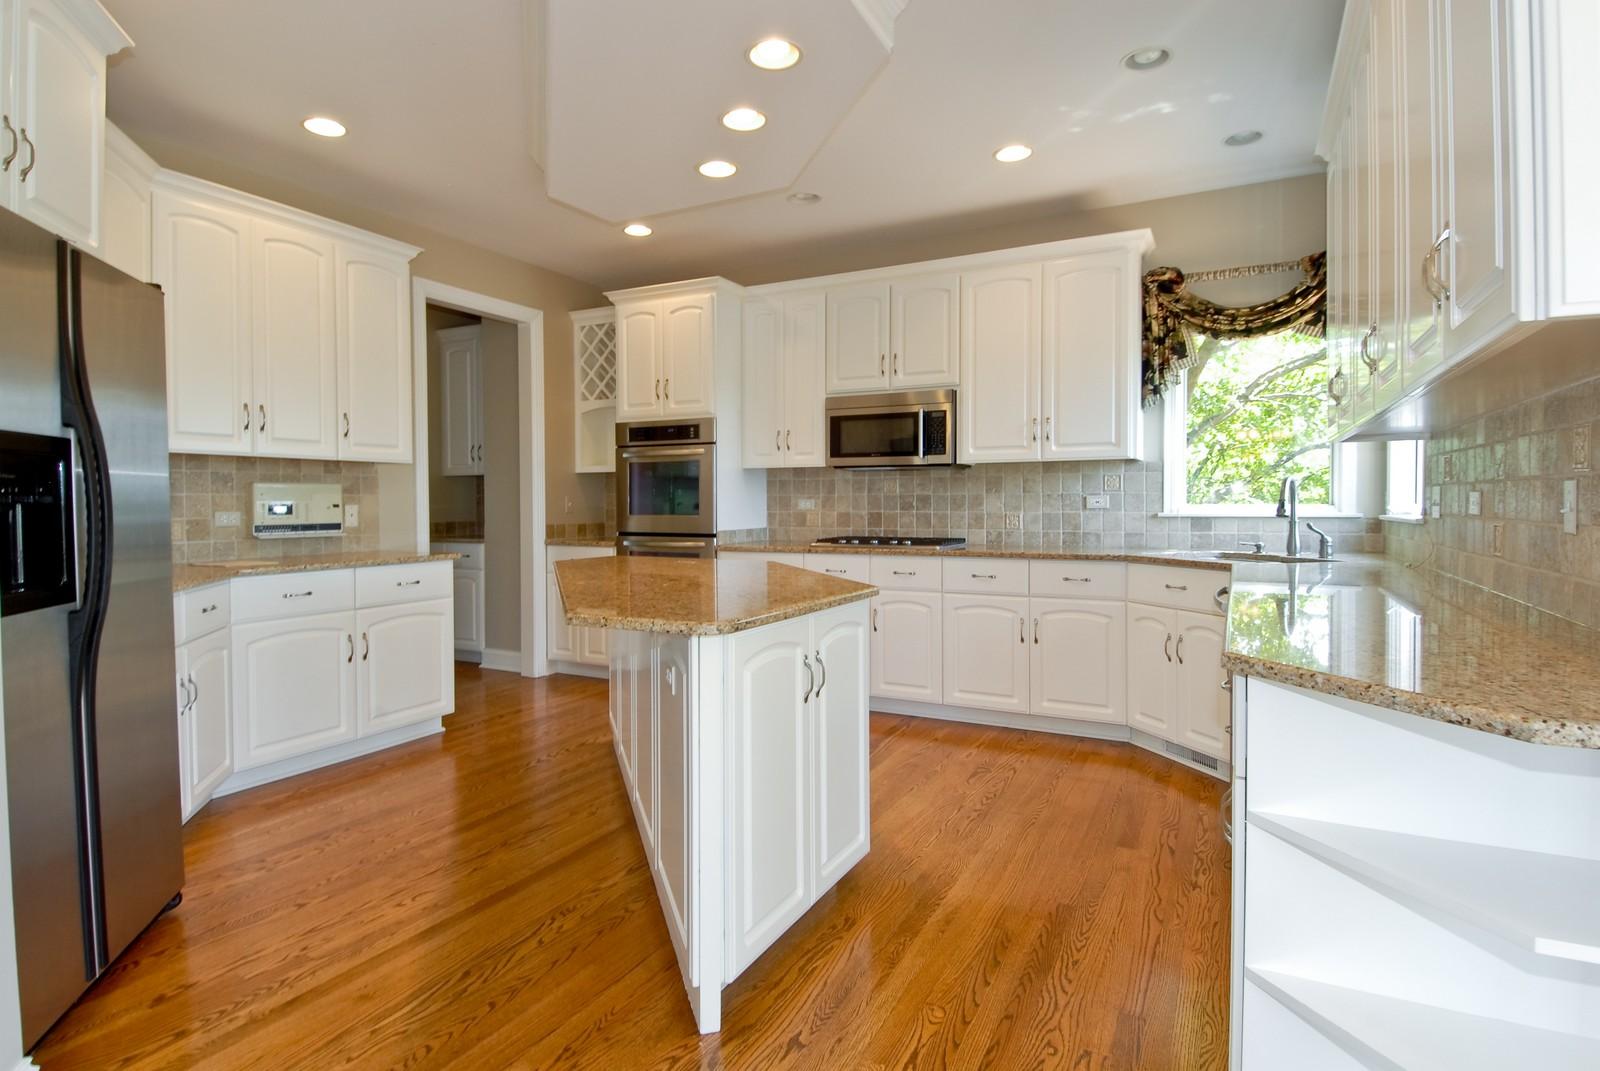 Real Estate Photography - 1264 Keim Ct, Geneva, IL, 60134 - Kitchen